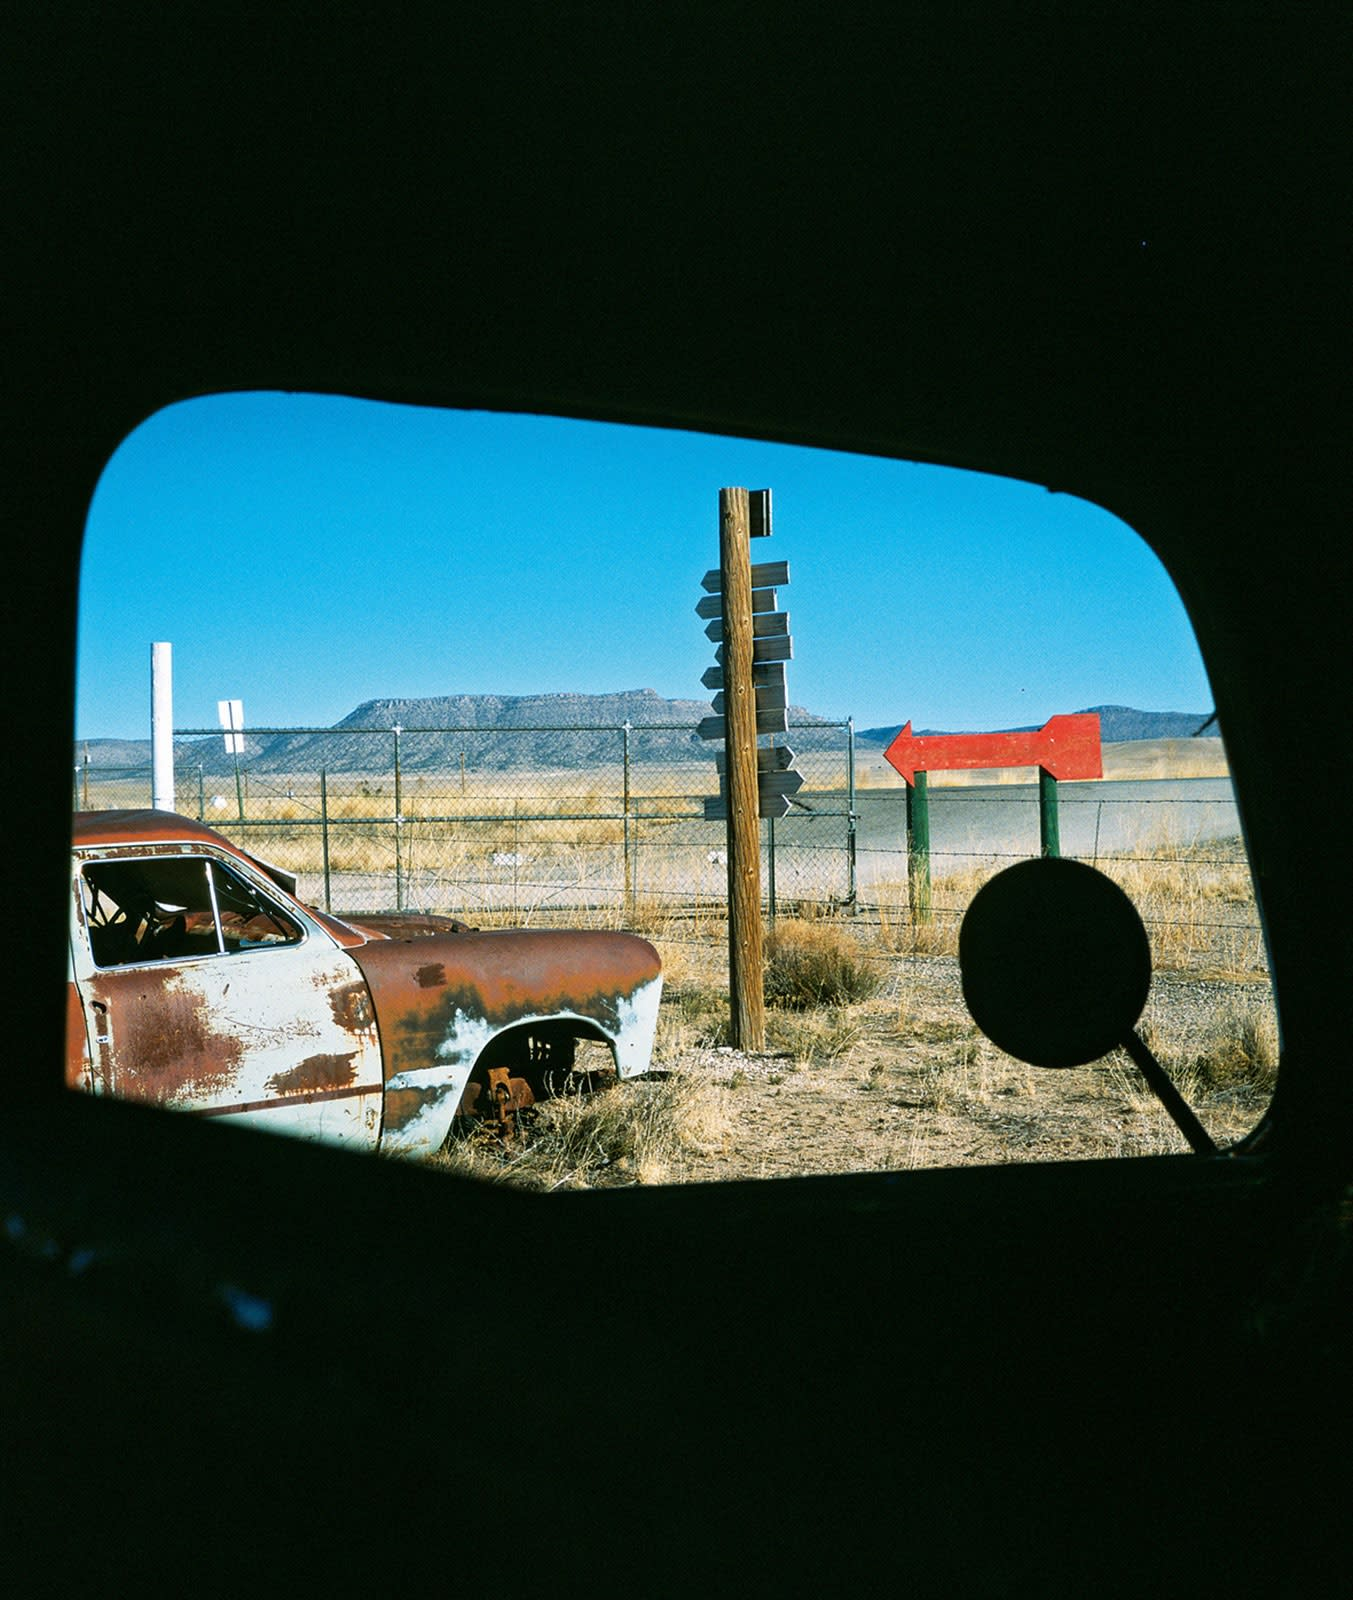 Jean-Christophe Béchet, Nevada #2, 2004